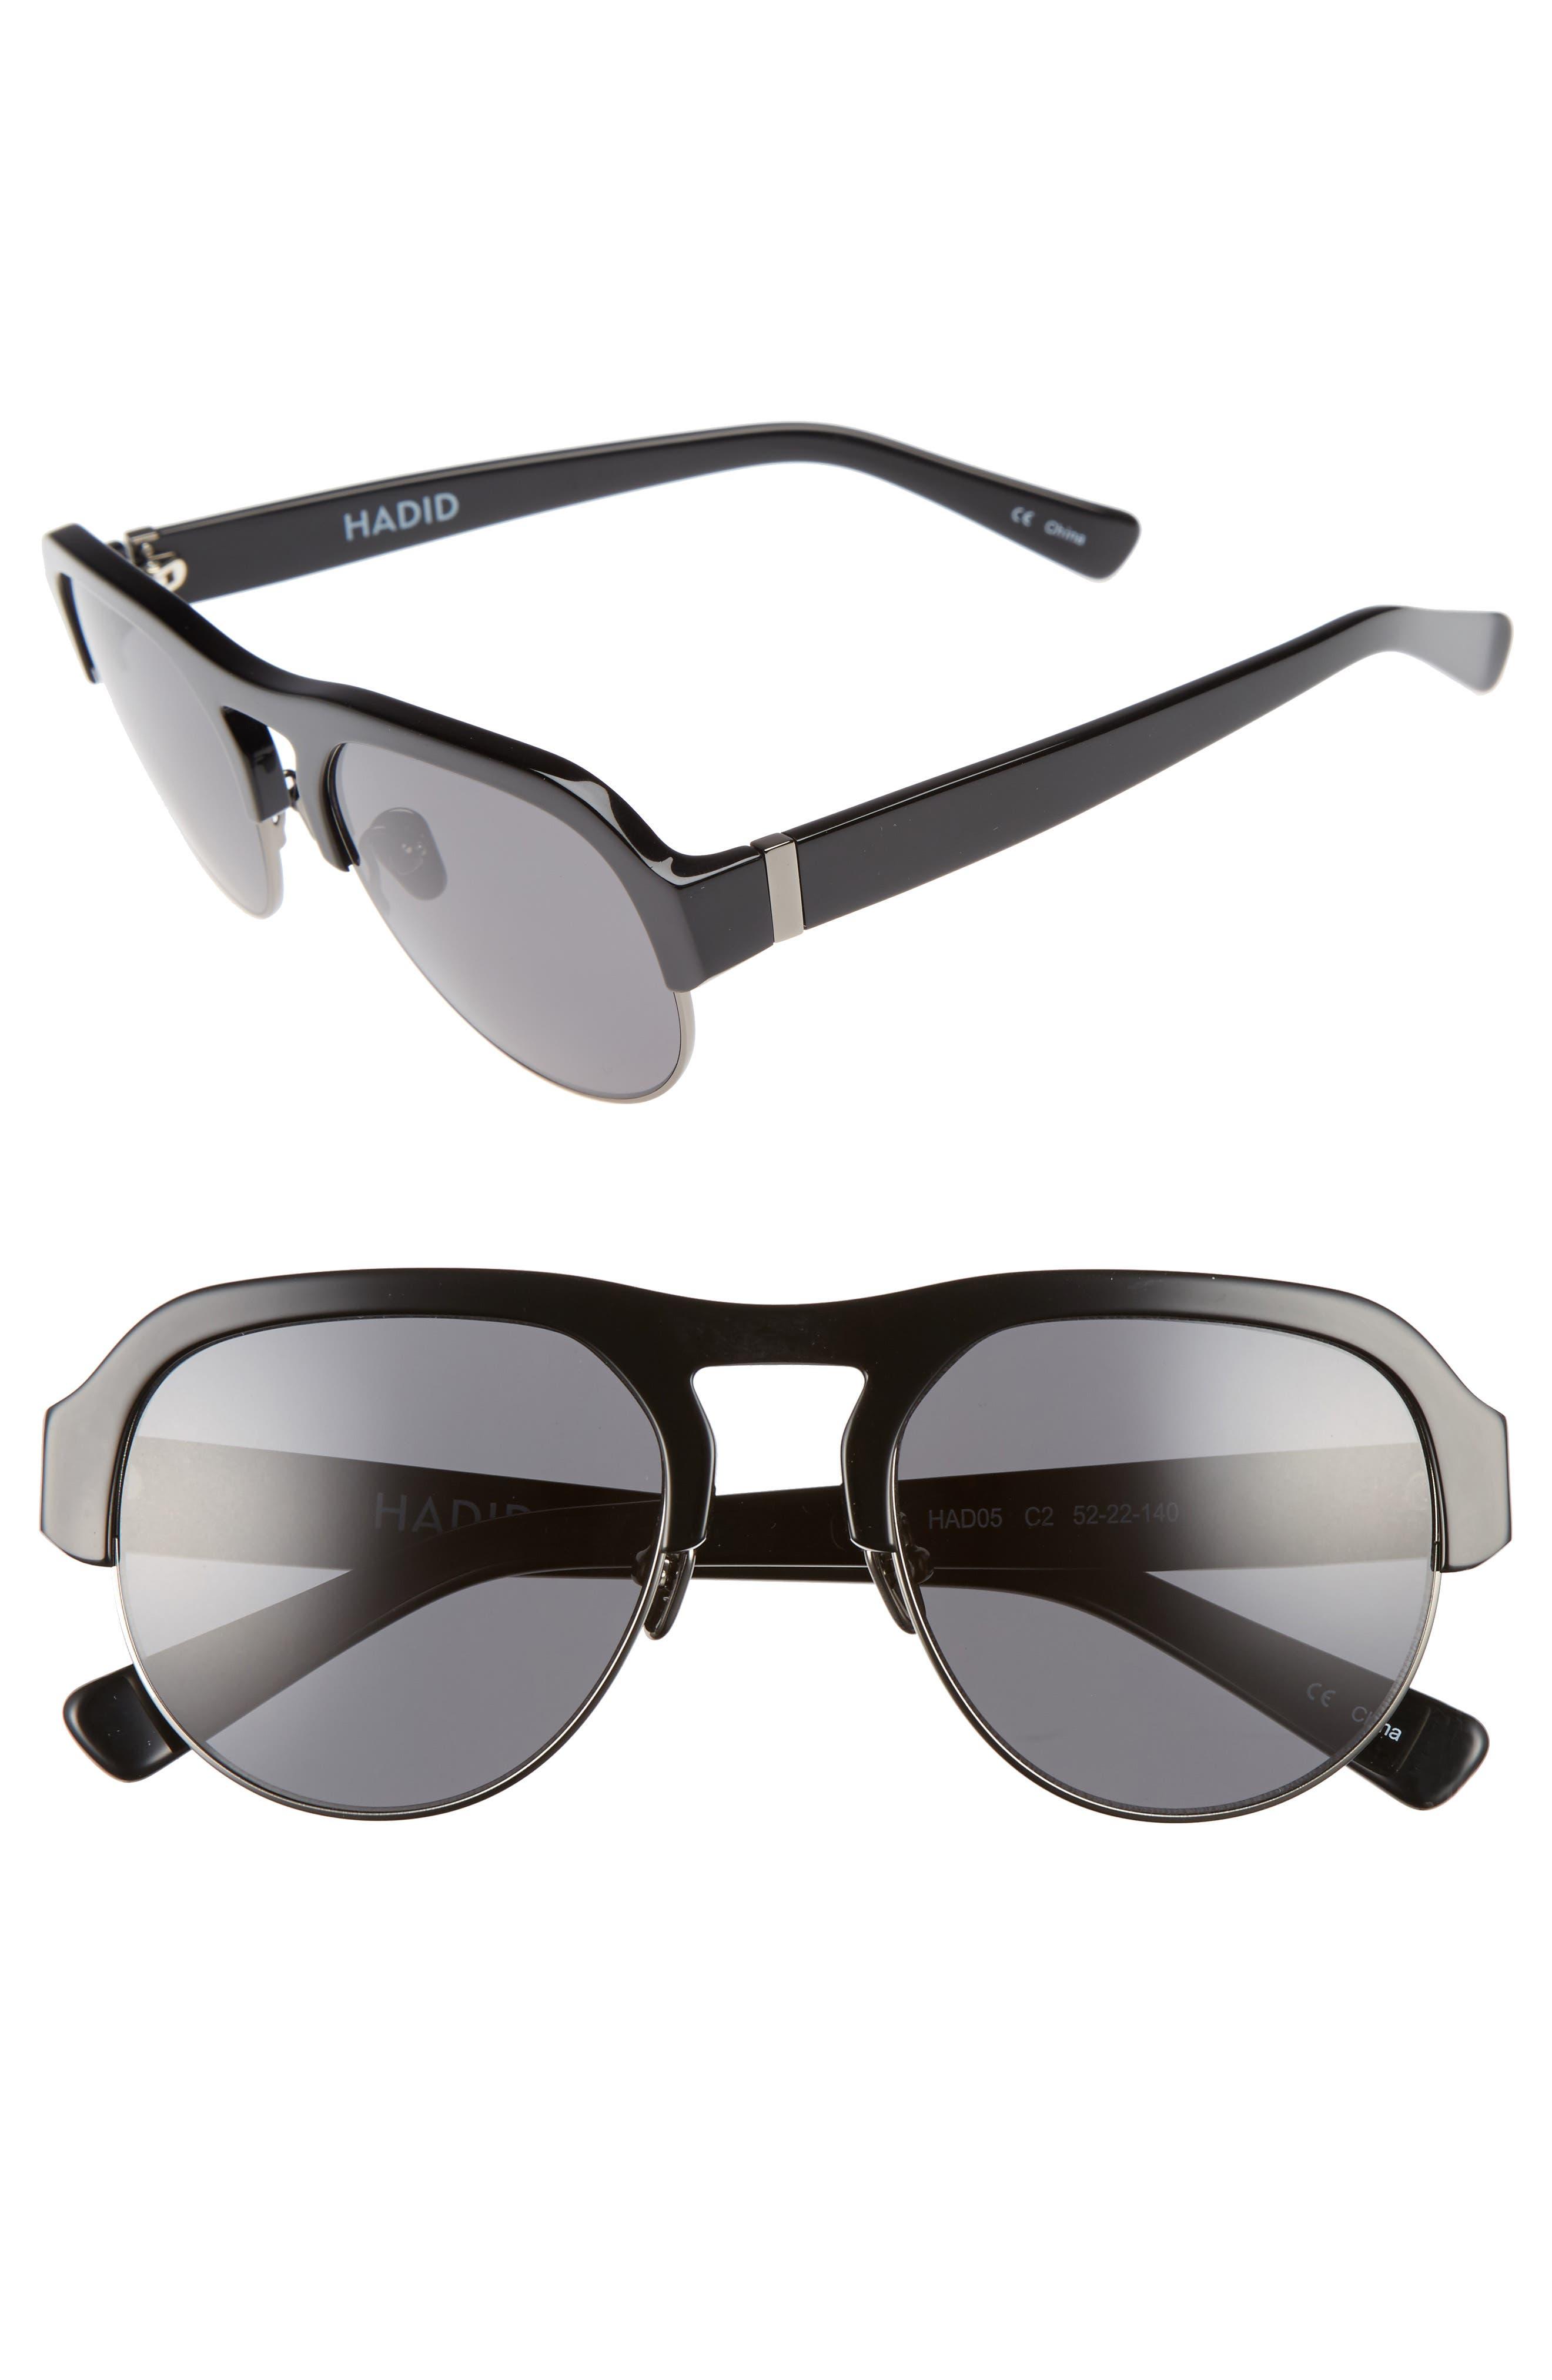 Nomad 52mm Sunglasses,                         Main,                         color, Black/ Gunmetal